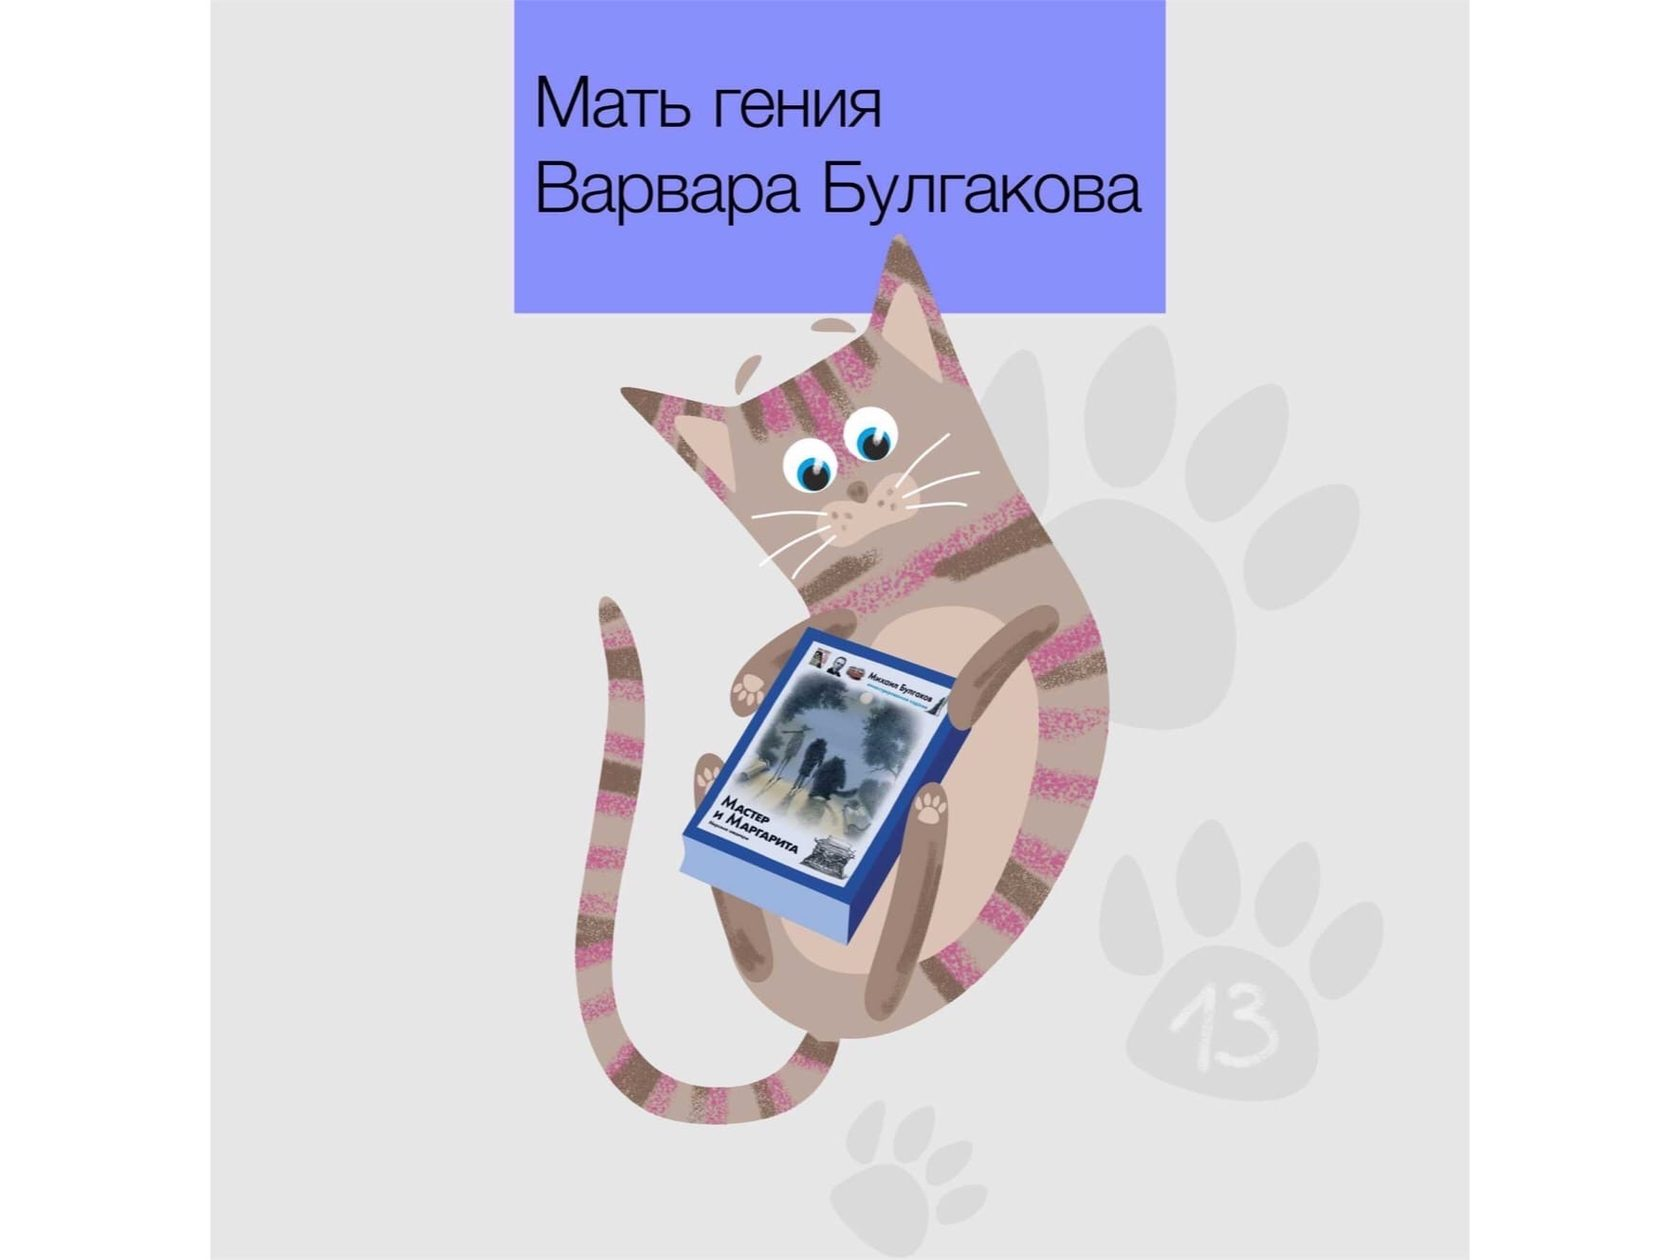 Котик любит Булгакова и математику